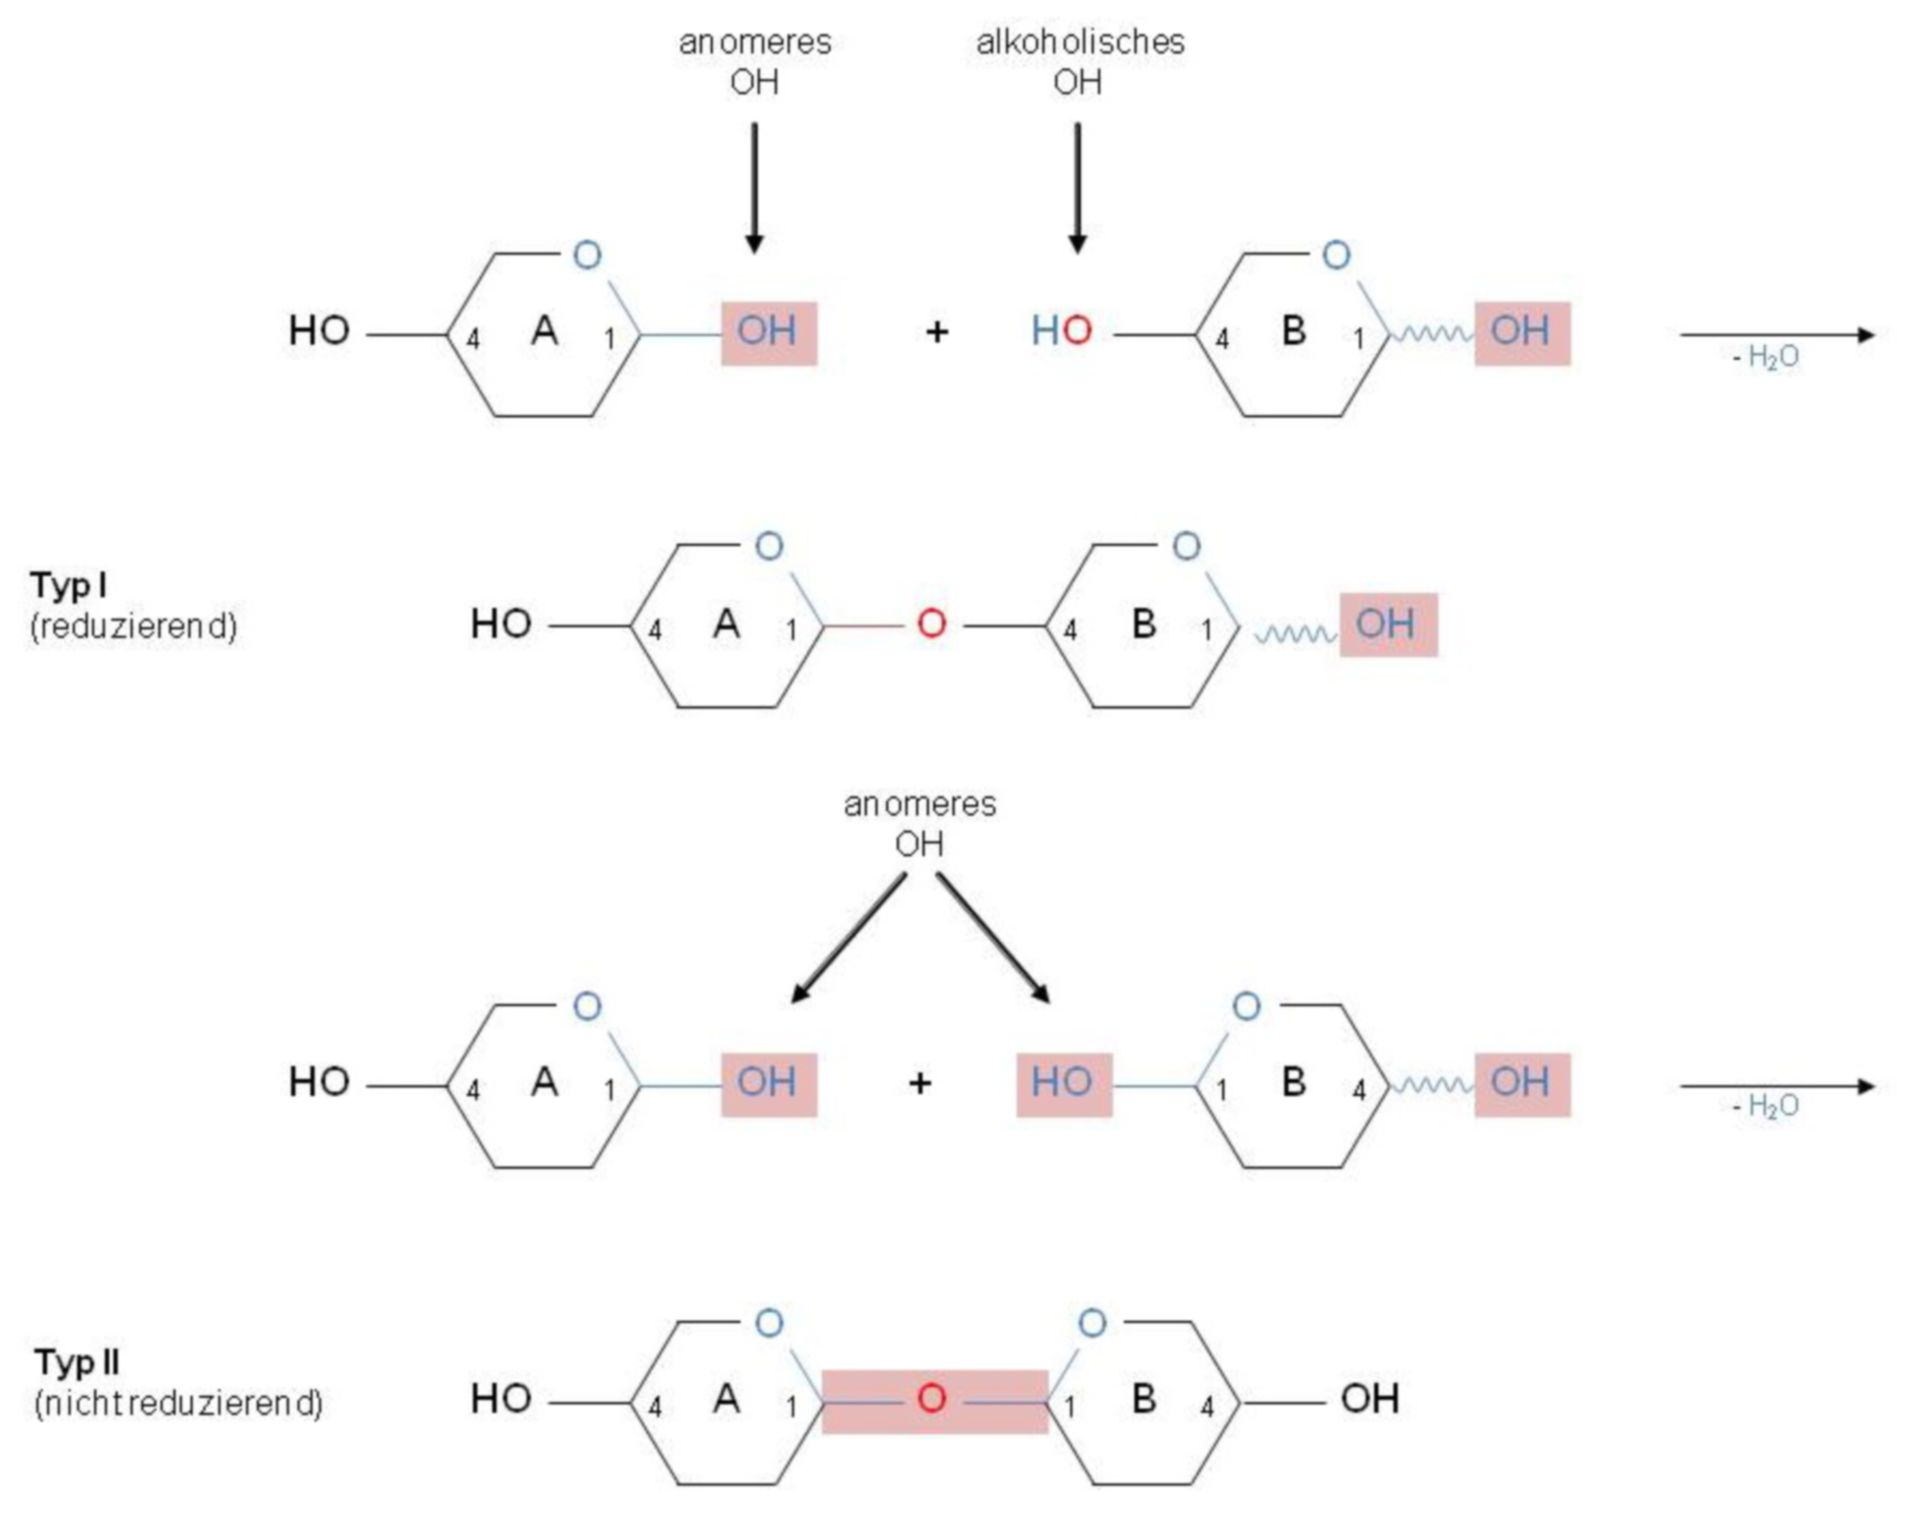 Disaccharid-Verknüpfung